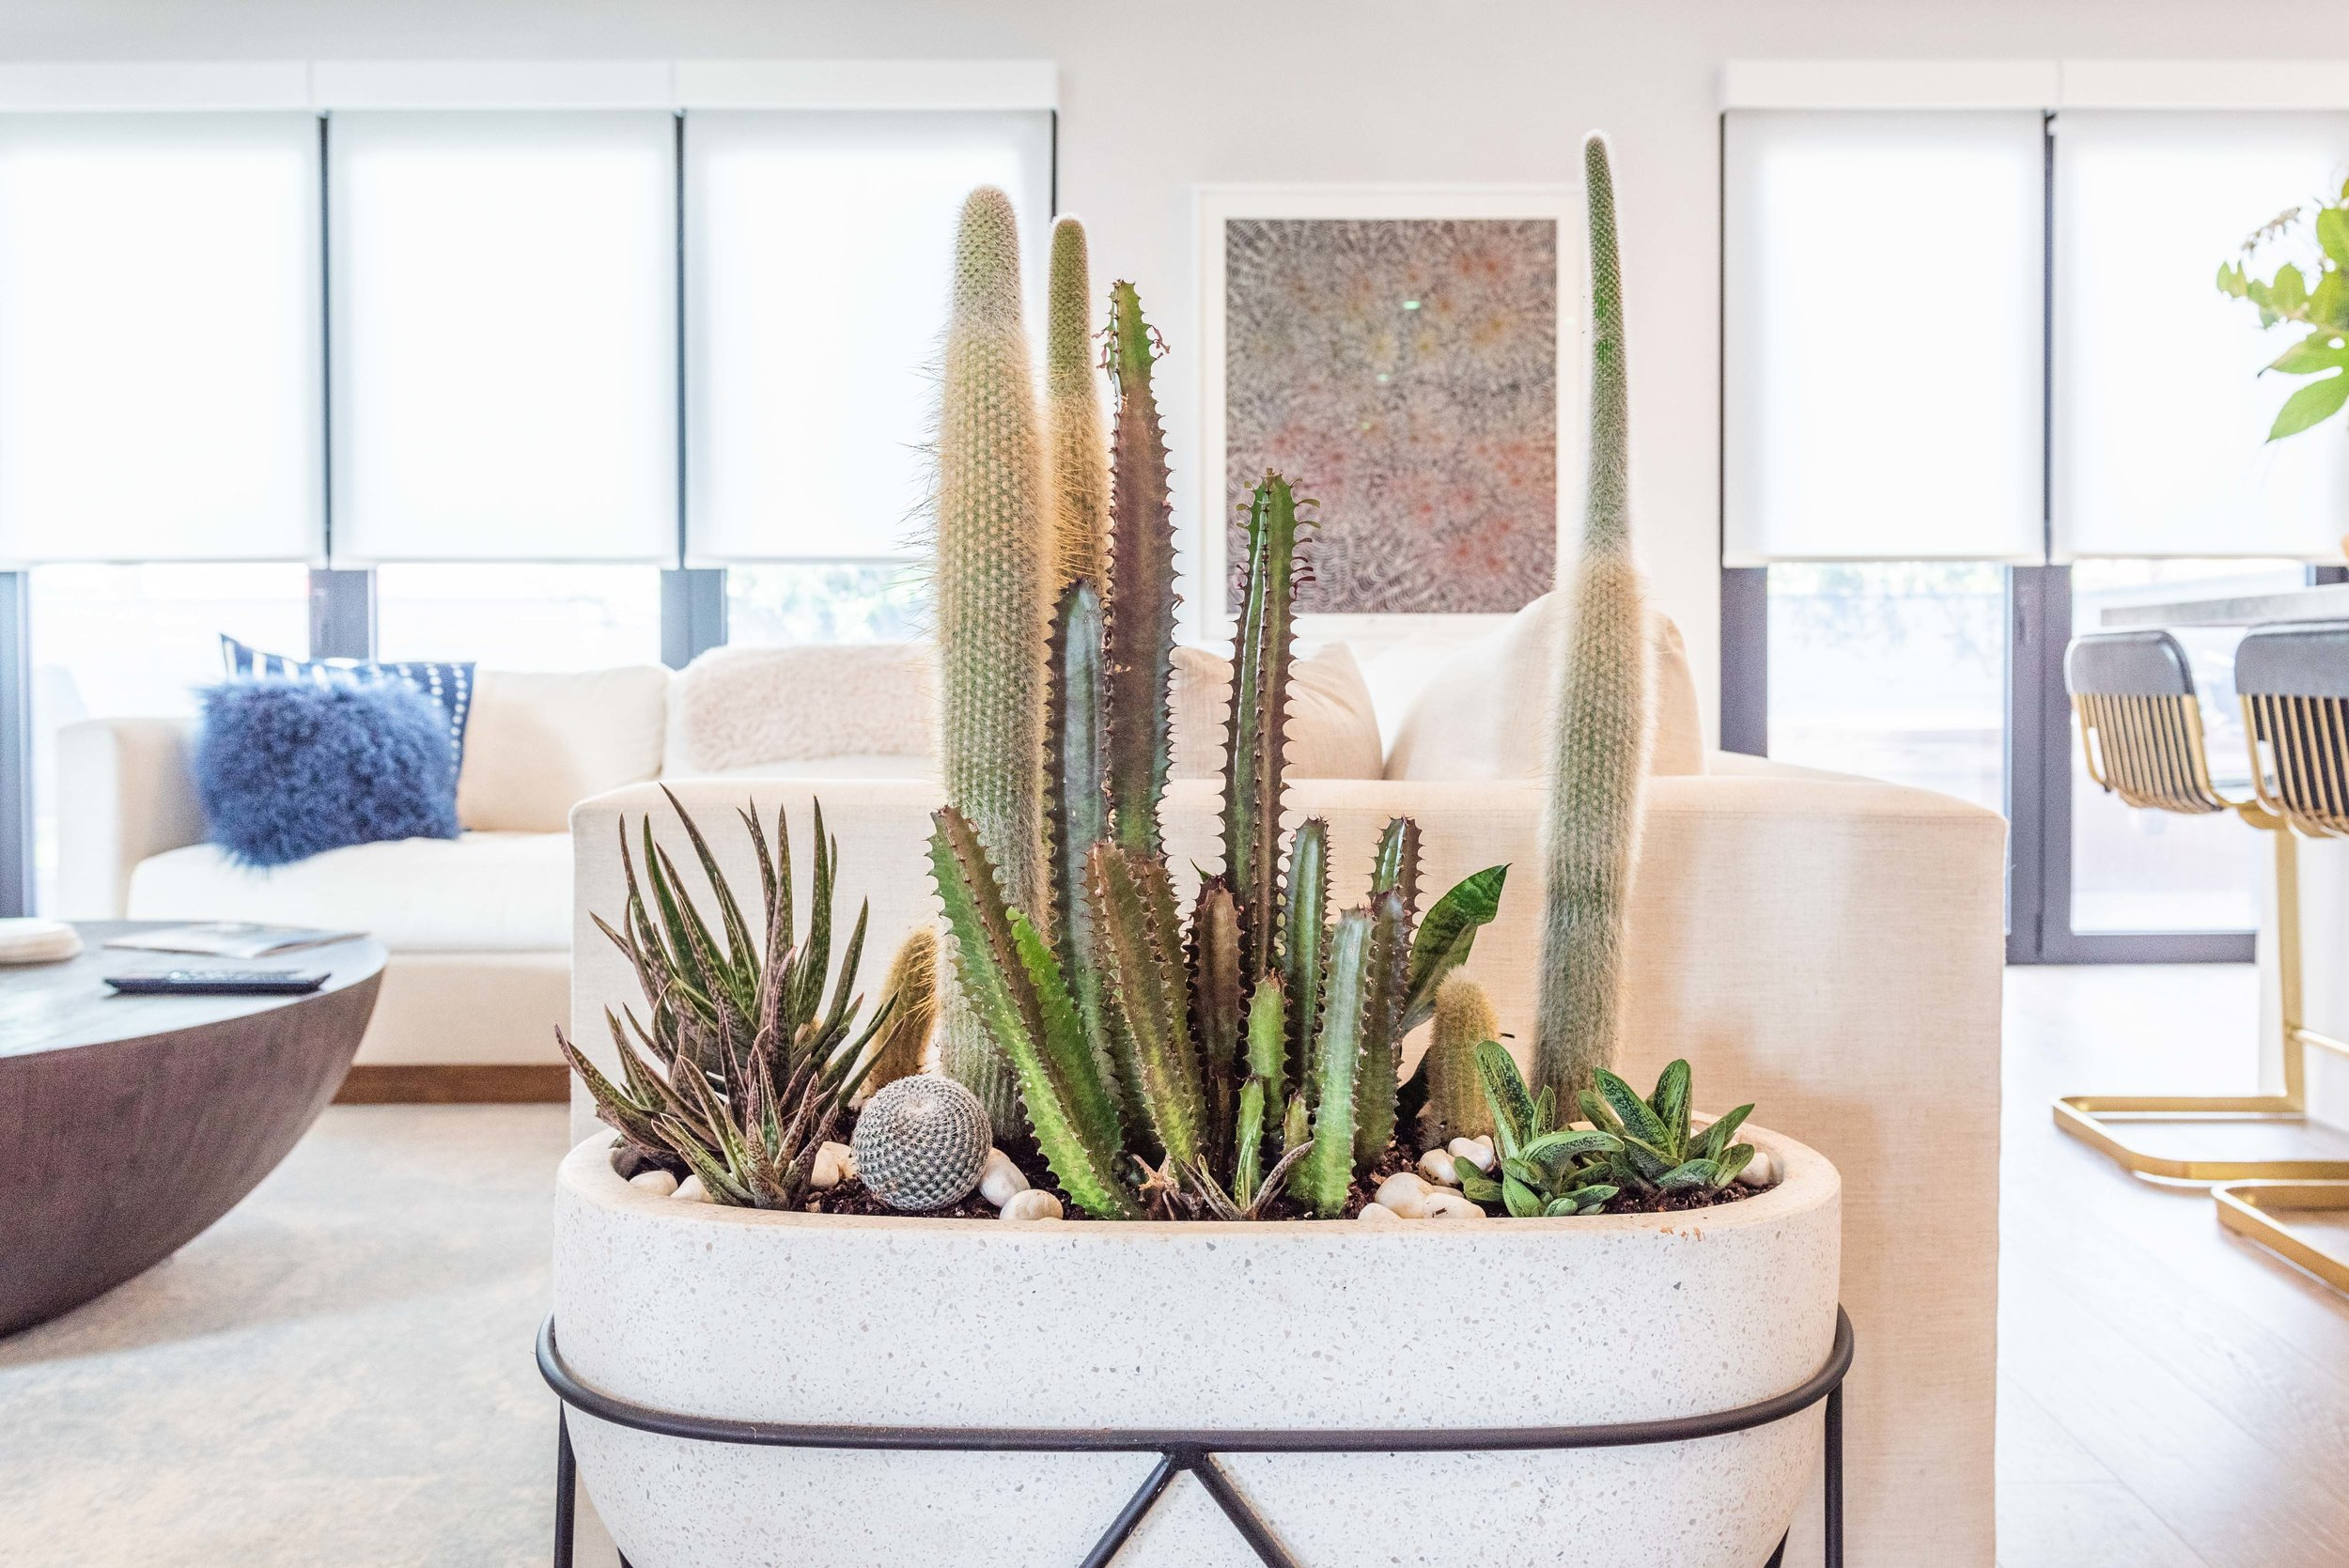 interior_plants-18.jpg